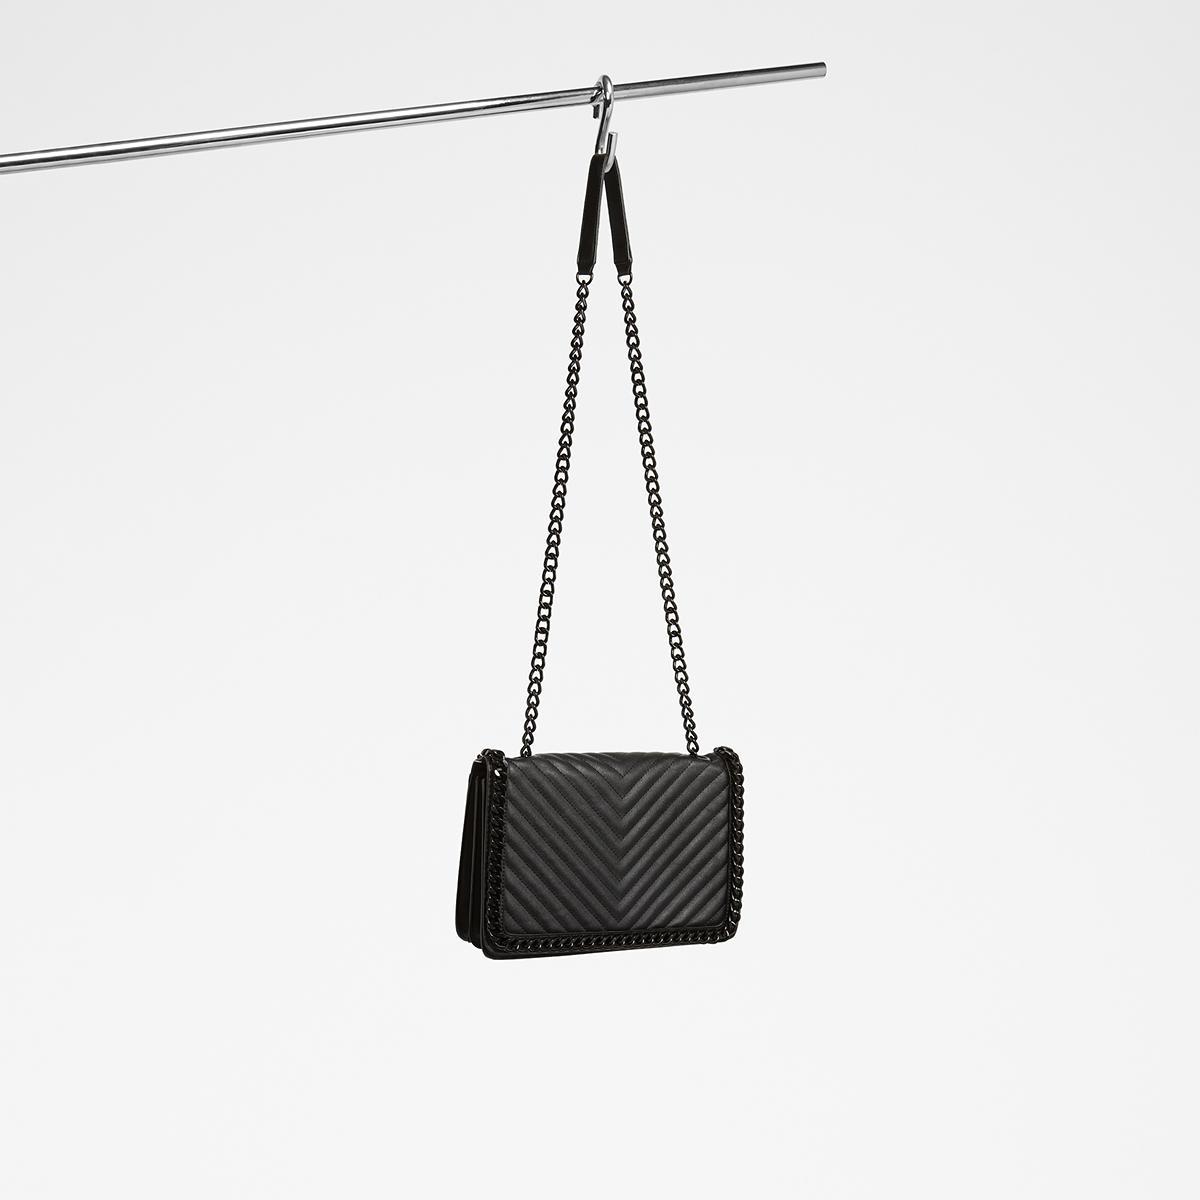 4d6084d9a6f Greenwald Black Women s Clutches   Evening Bags